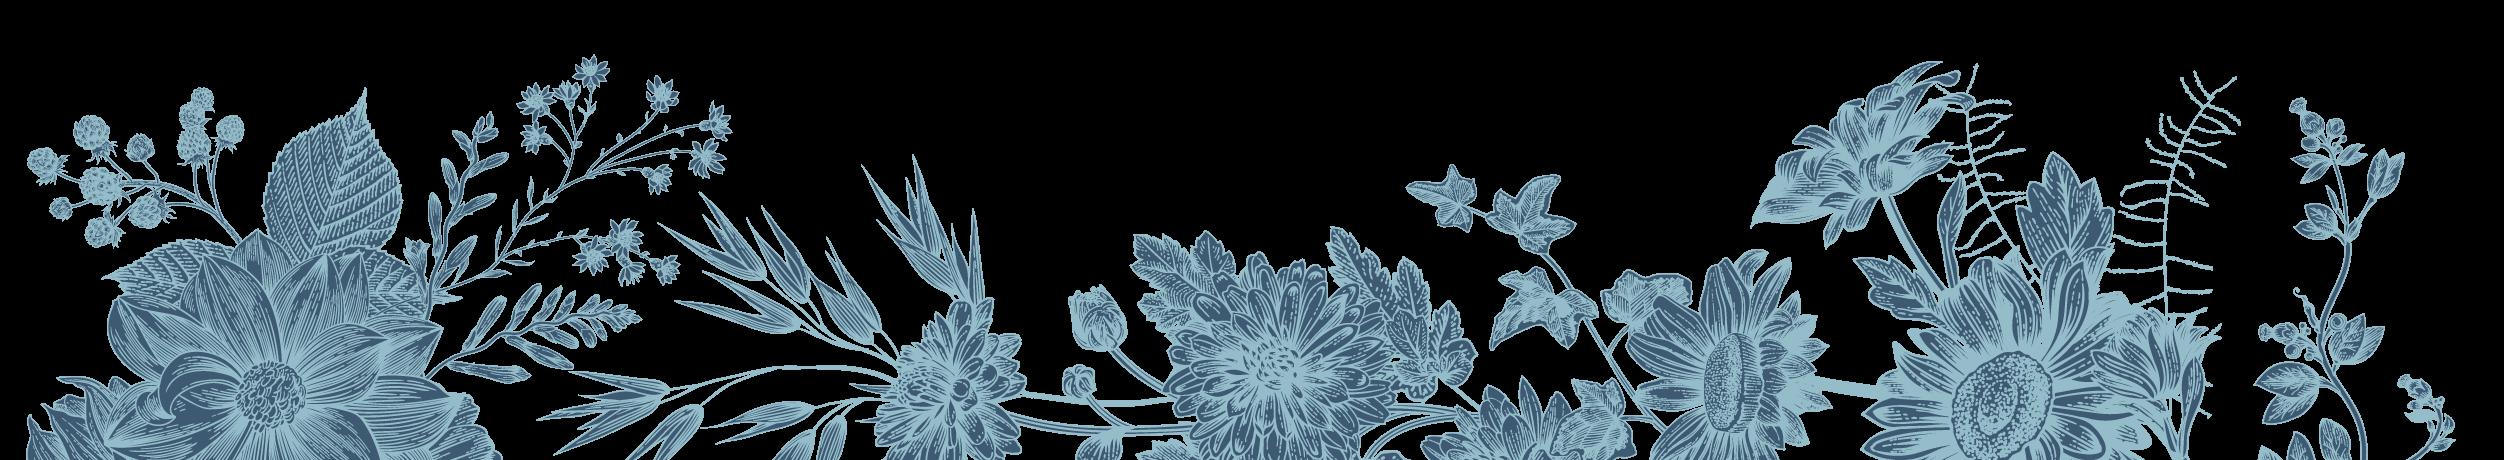 Illustrated floral banner.